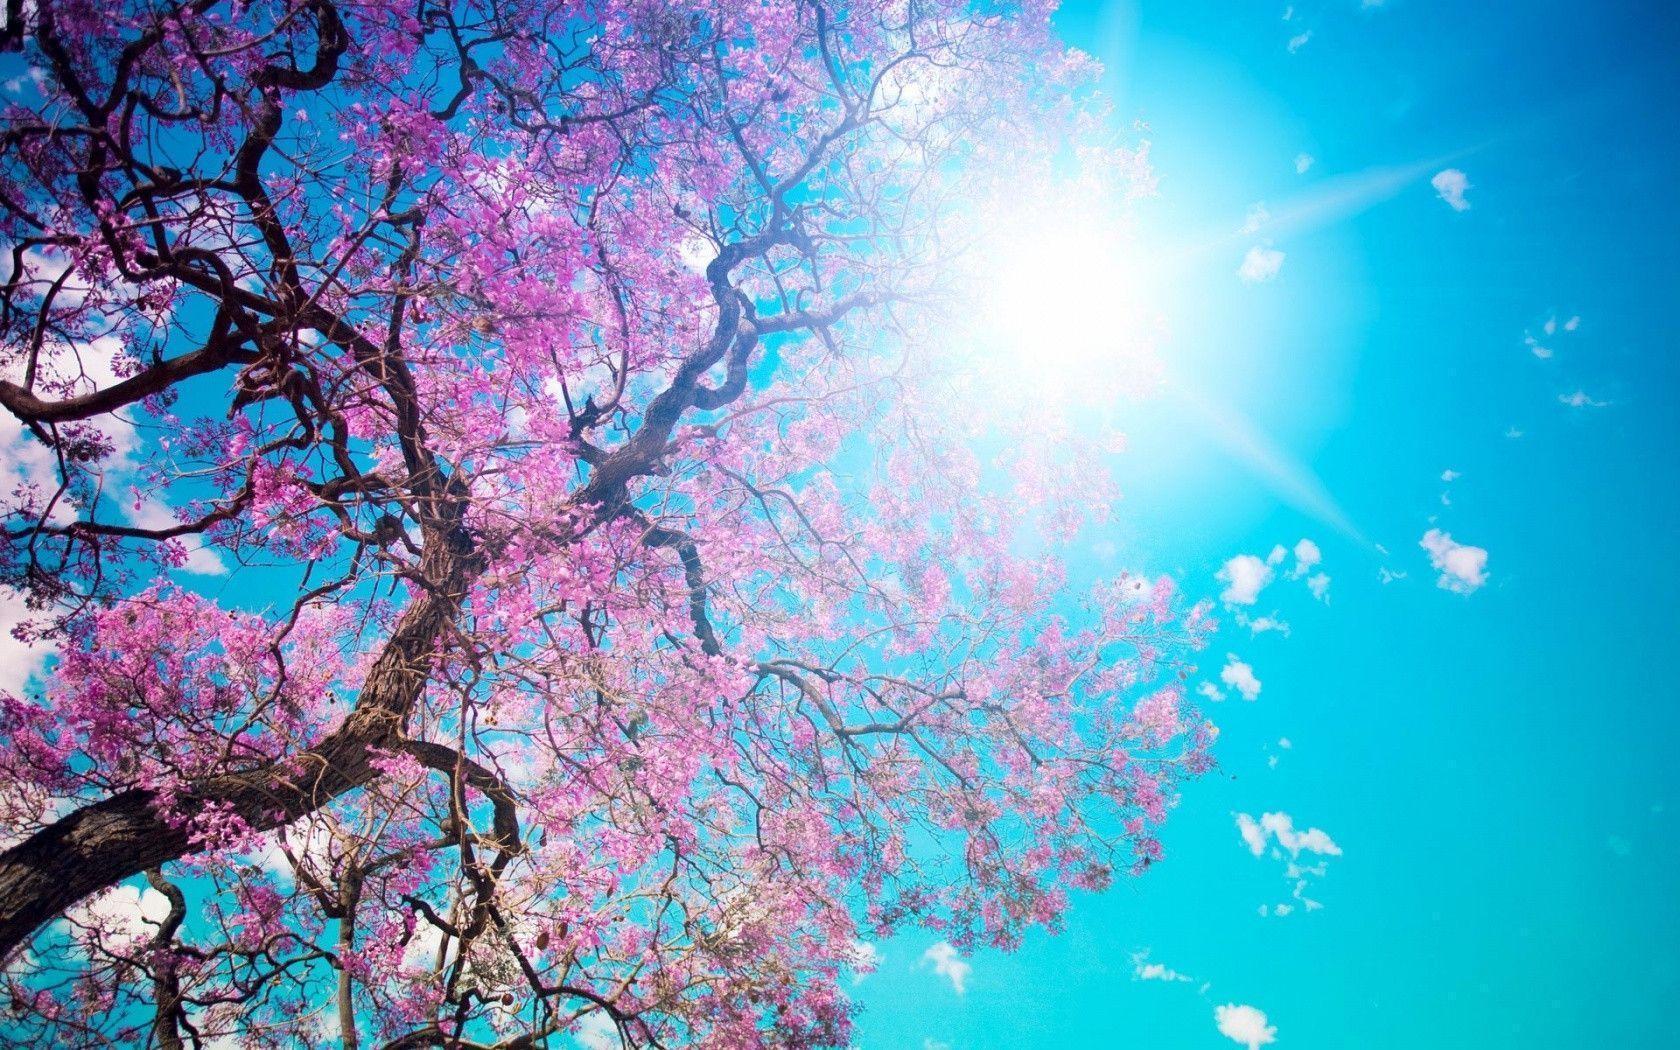 Spring Desktop Wallpapers   Top Spring Desktop Backgrounds 1680x1050